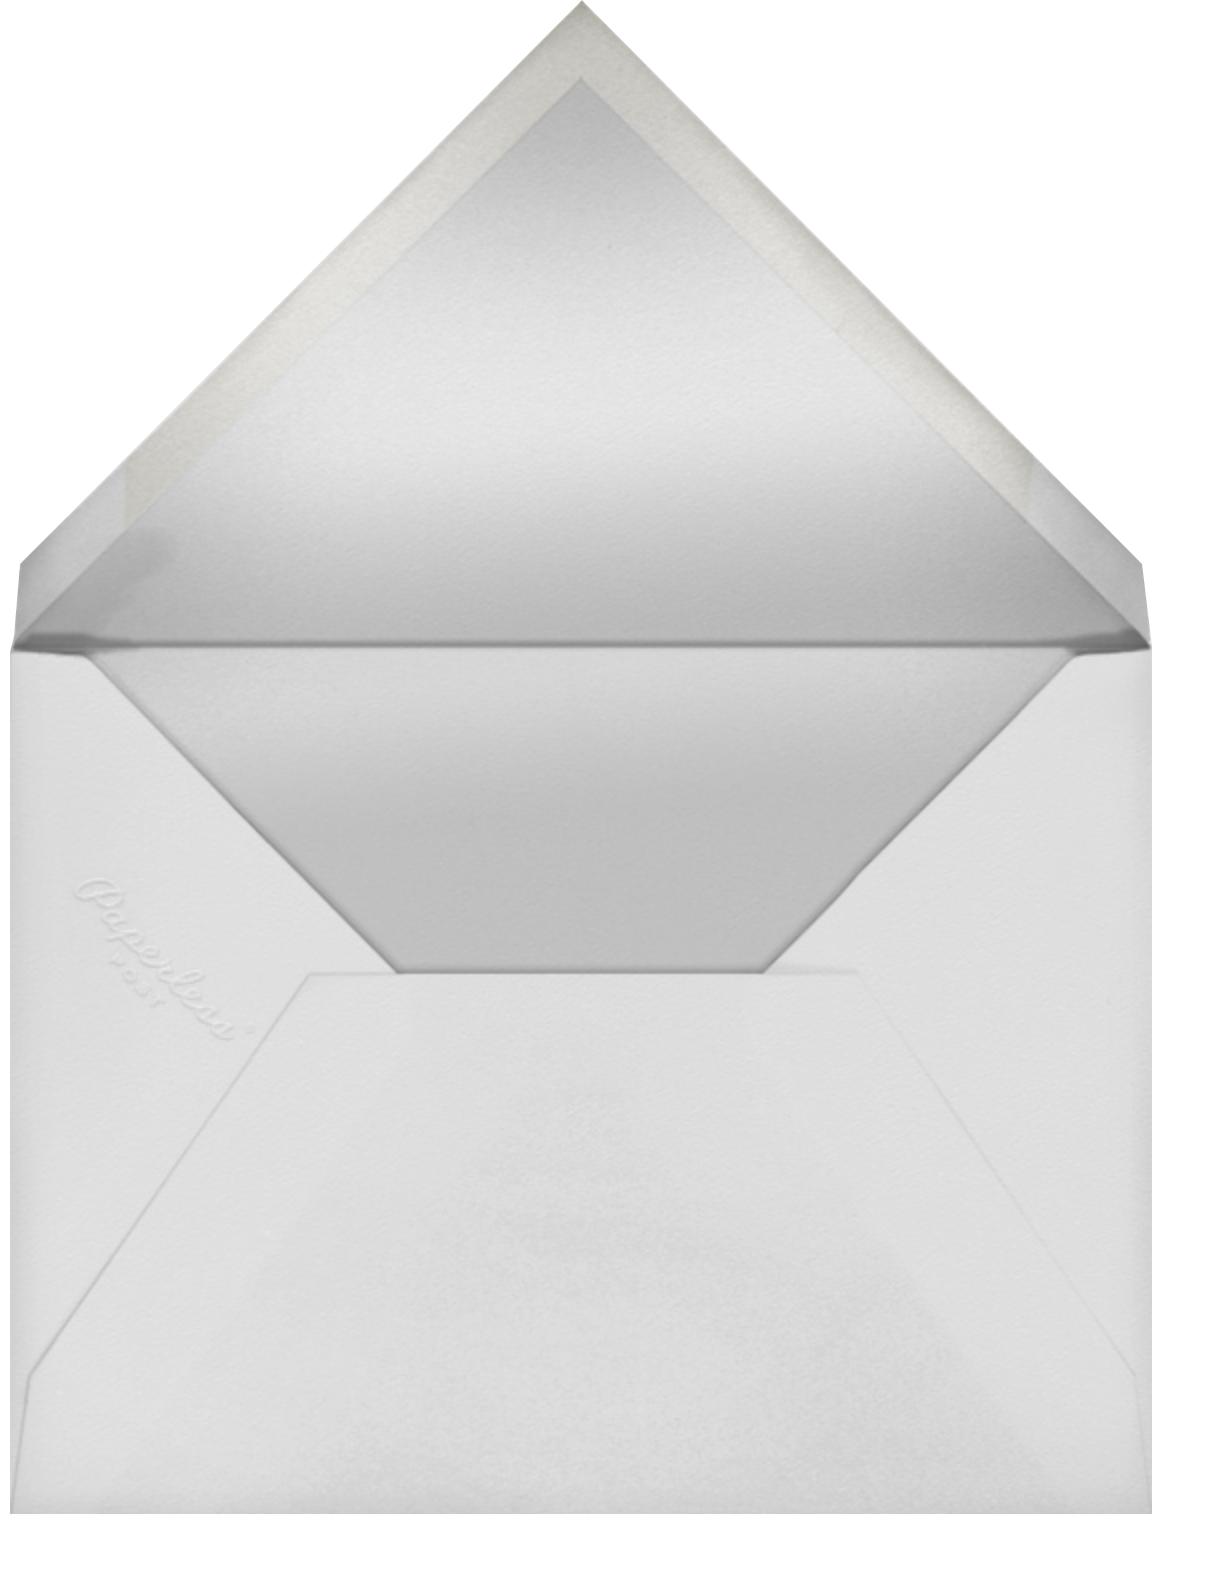 Melbourne  Skyline View (Menu) - White/Black - Paperless Post - Menus - envelope back